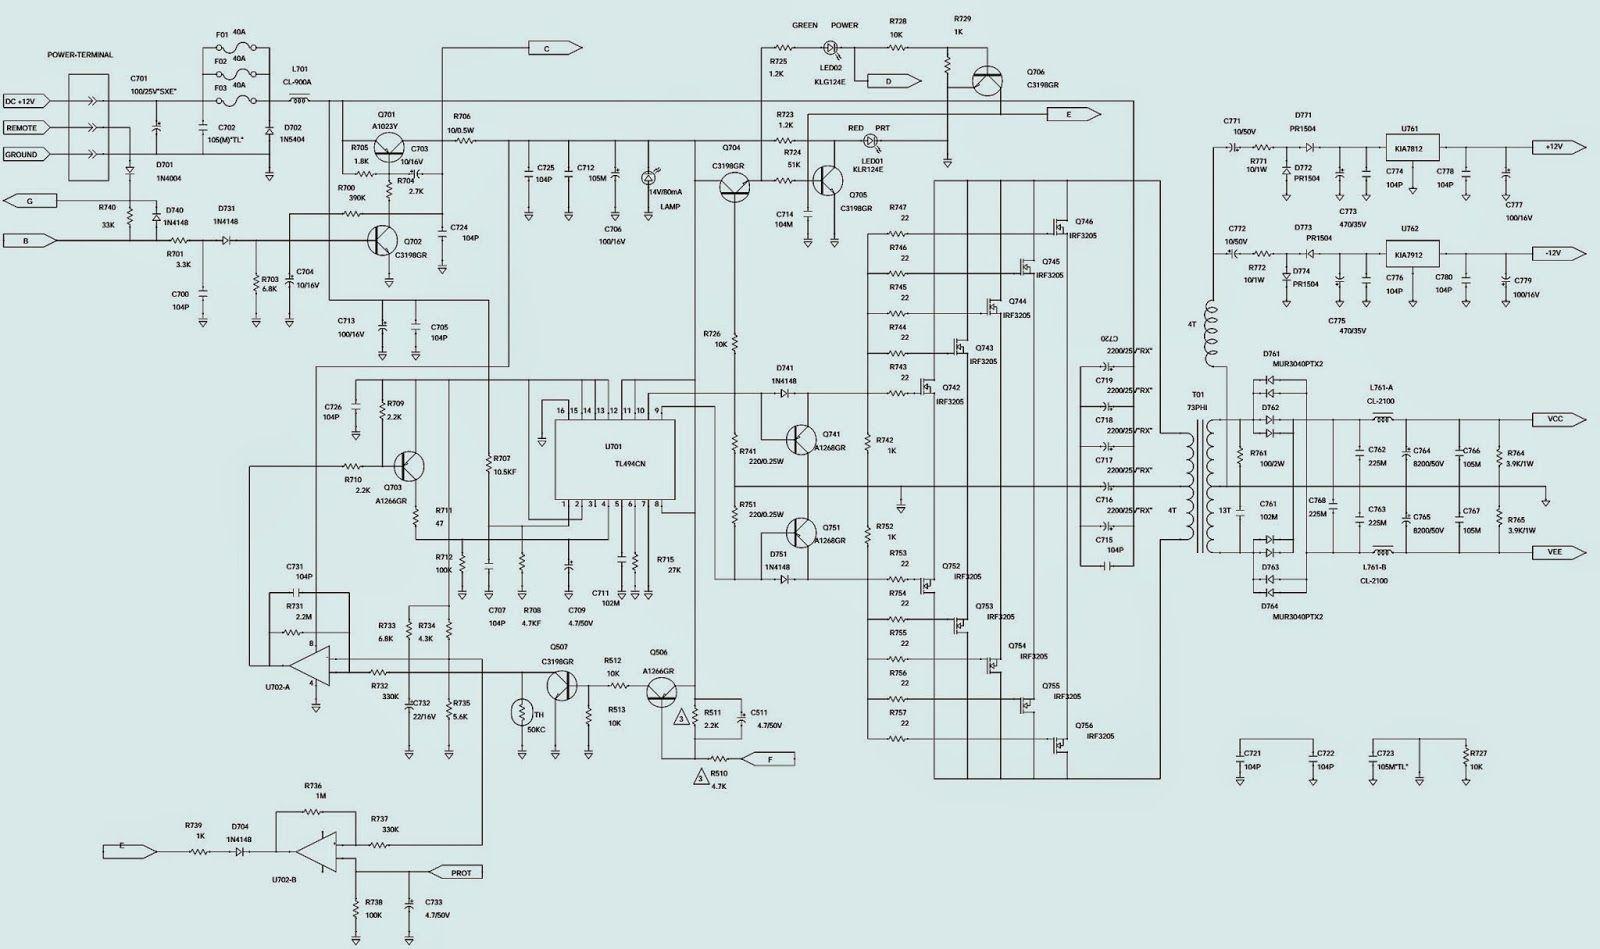 medium resolution of jbl wiring diagram diagram data schema jbl wiring diagram jbl bp 1200 sub wiring diagram wiring